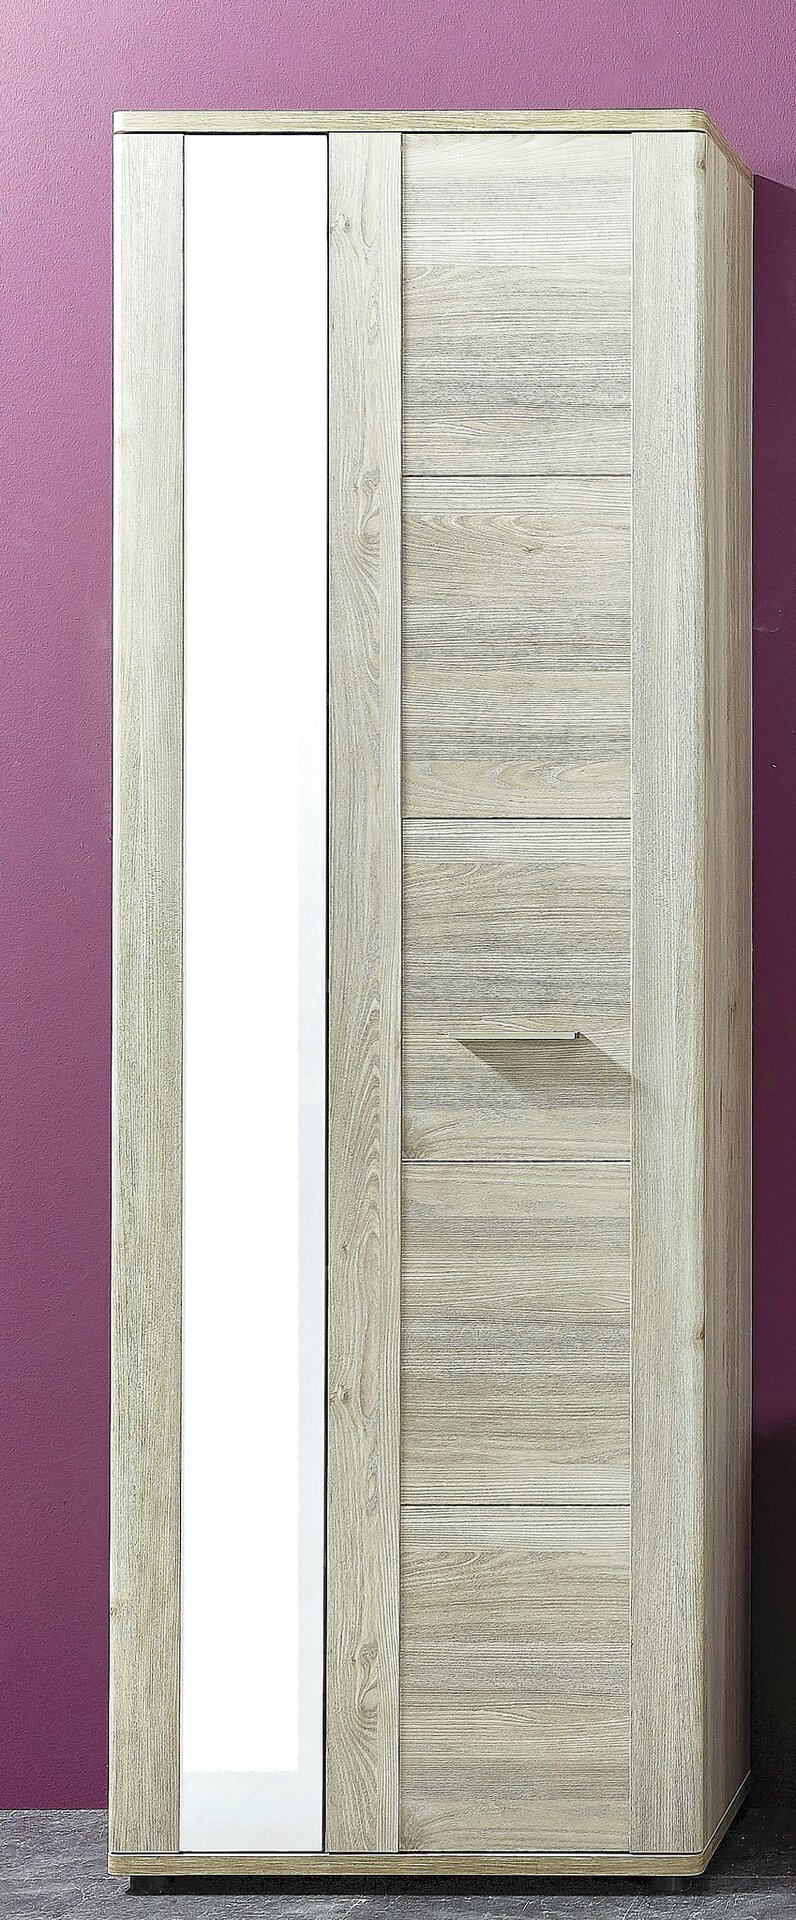 Garderobenschrank PETRINA Vito Holzwerkstoff mehrfarbig 38 x 198 x 66 cm